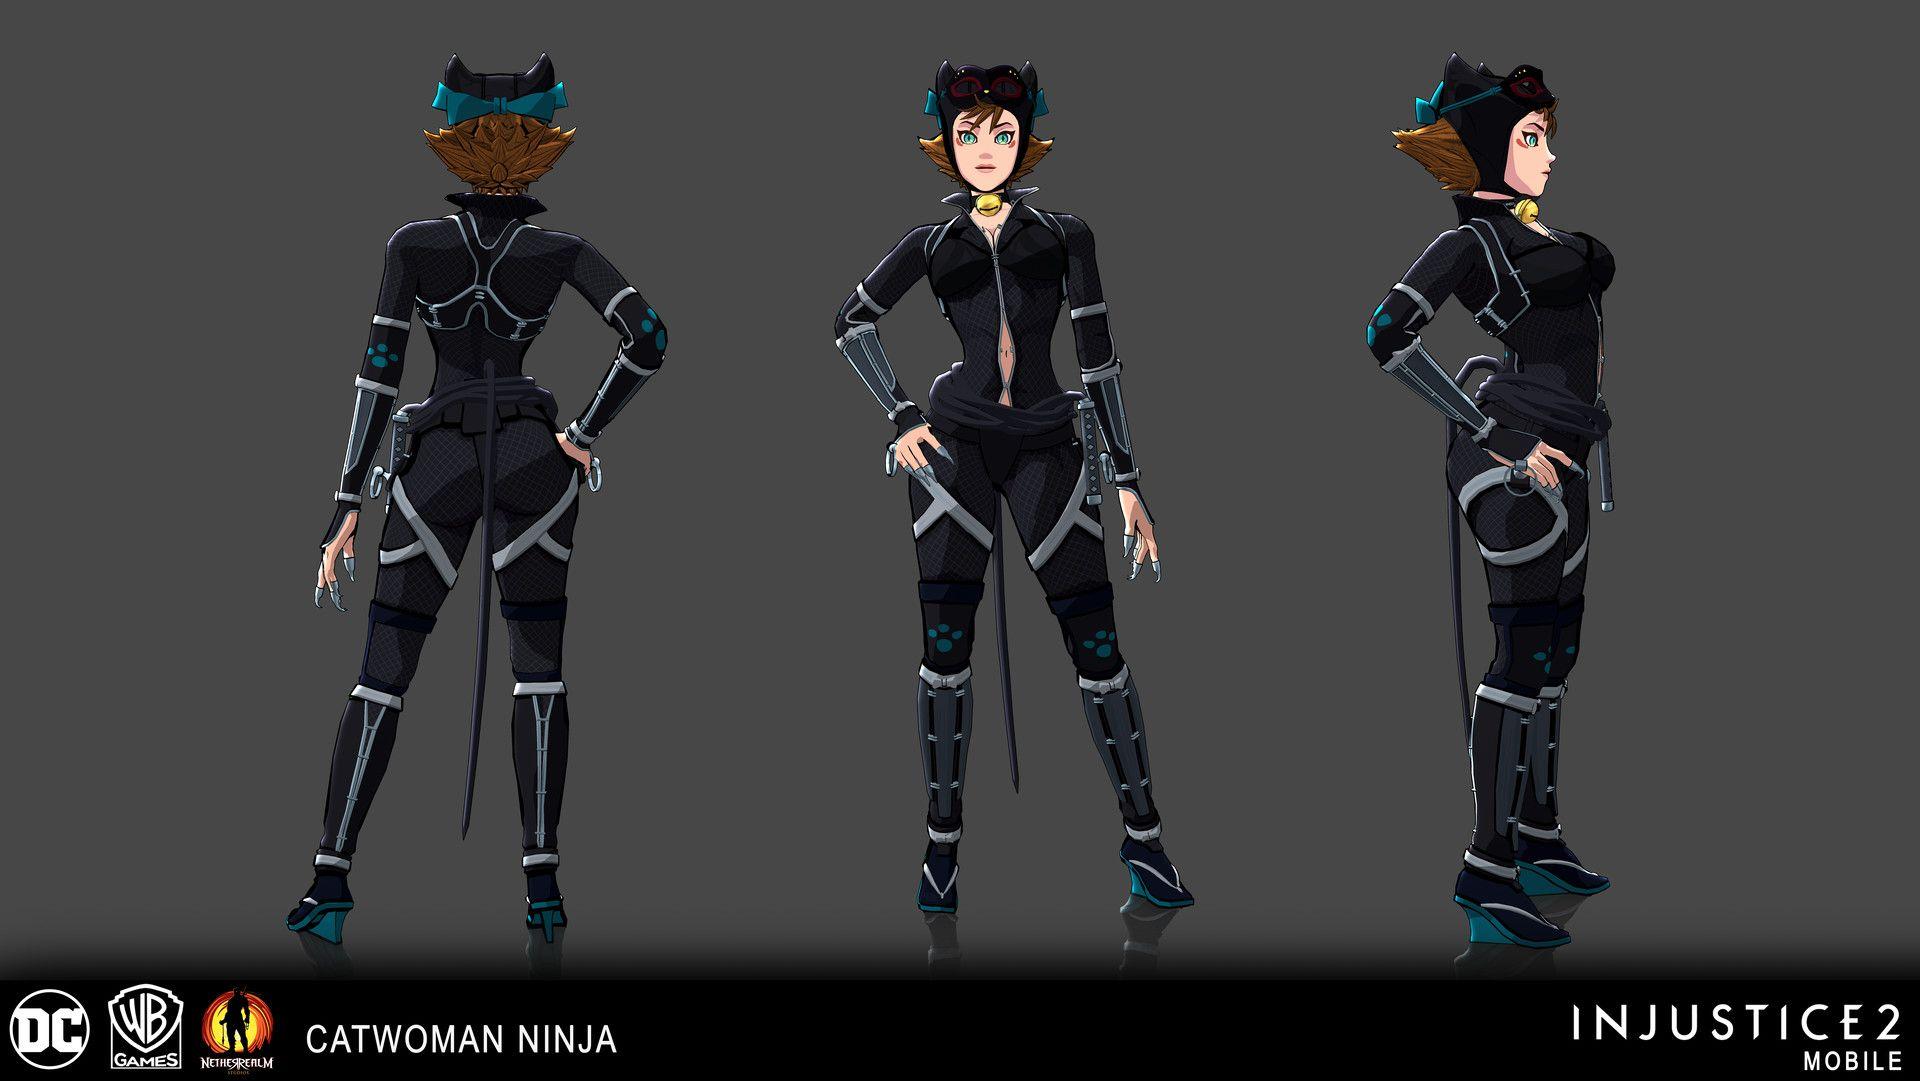 Artstation Injustice 2 Mobile Catwoman Ninja Nick Cashio Catwoman Cosplay Cat Woman Costume Catwoman